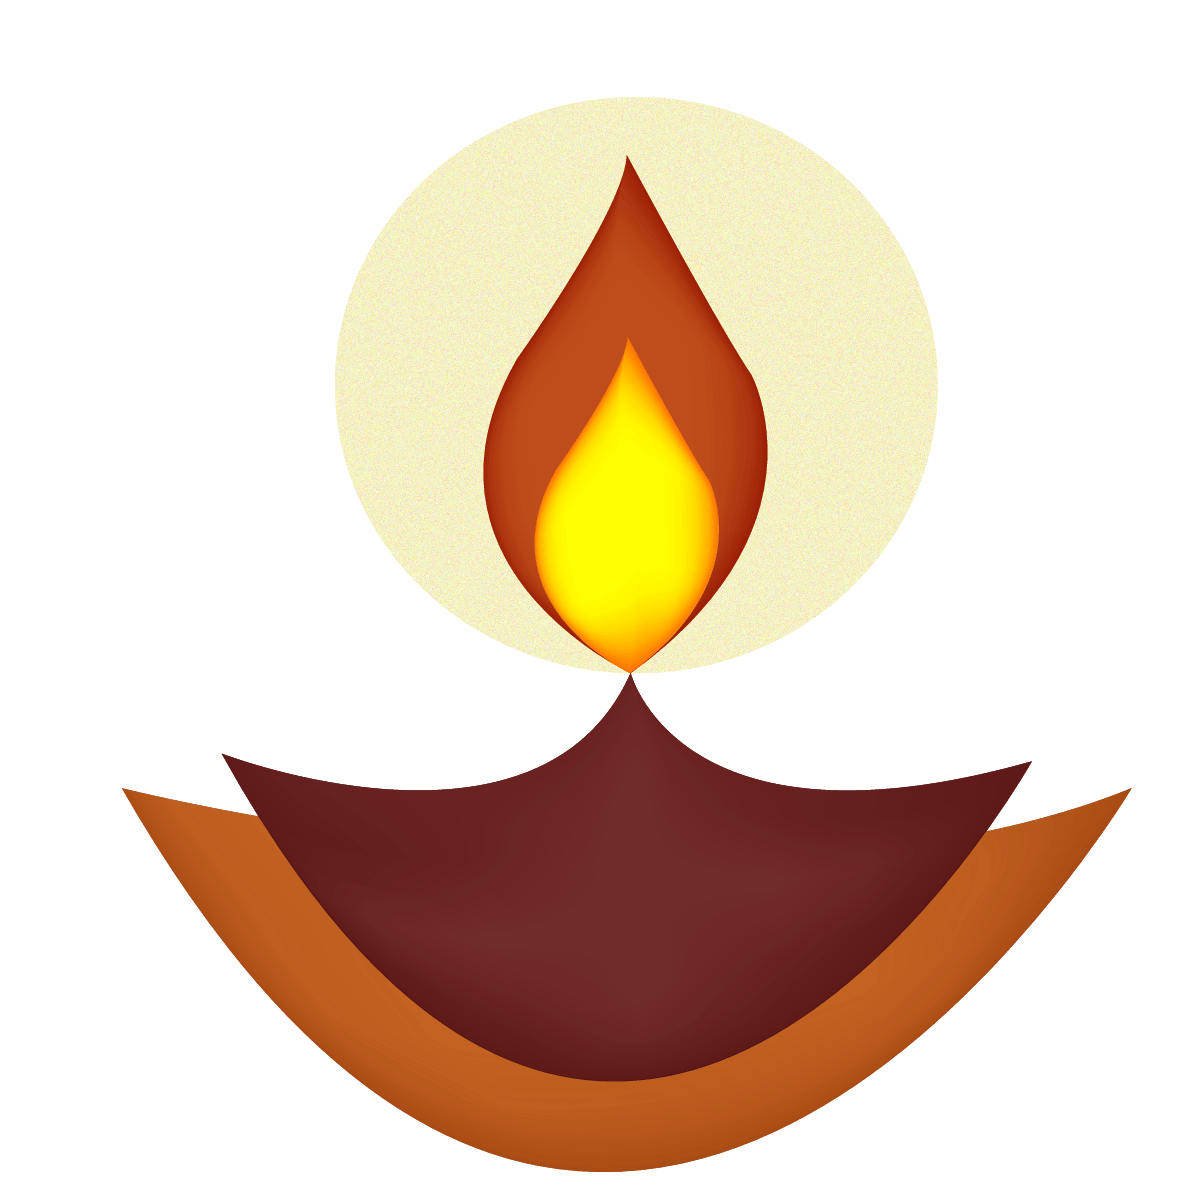 Happy Diwali Clipart 2021